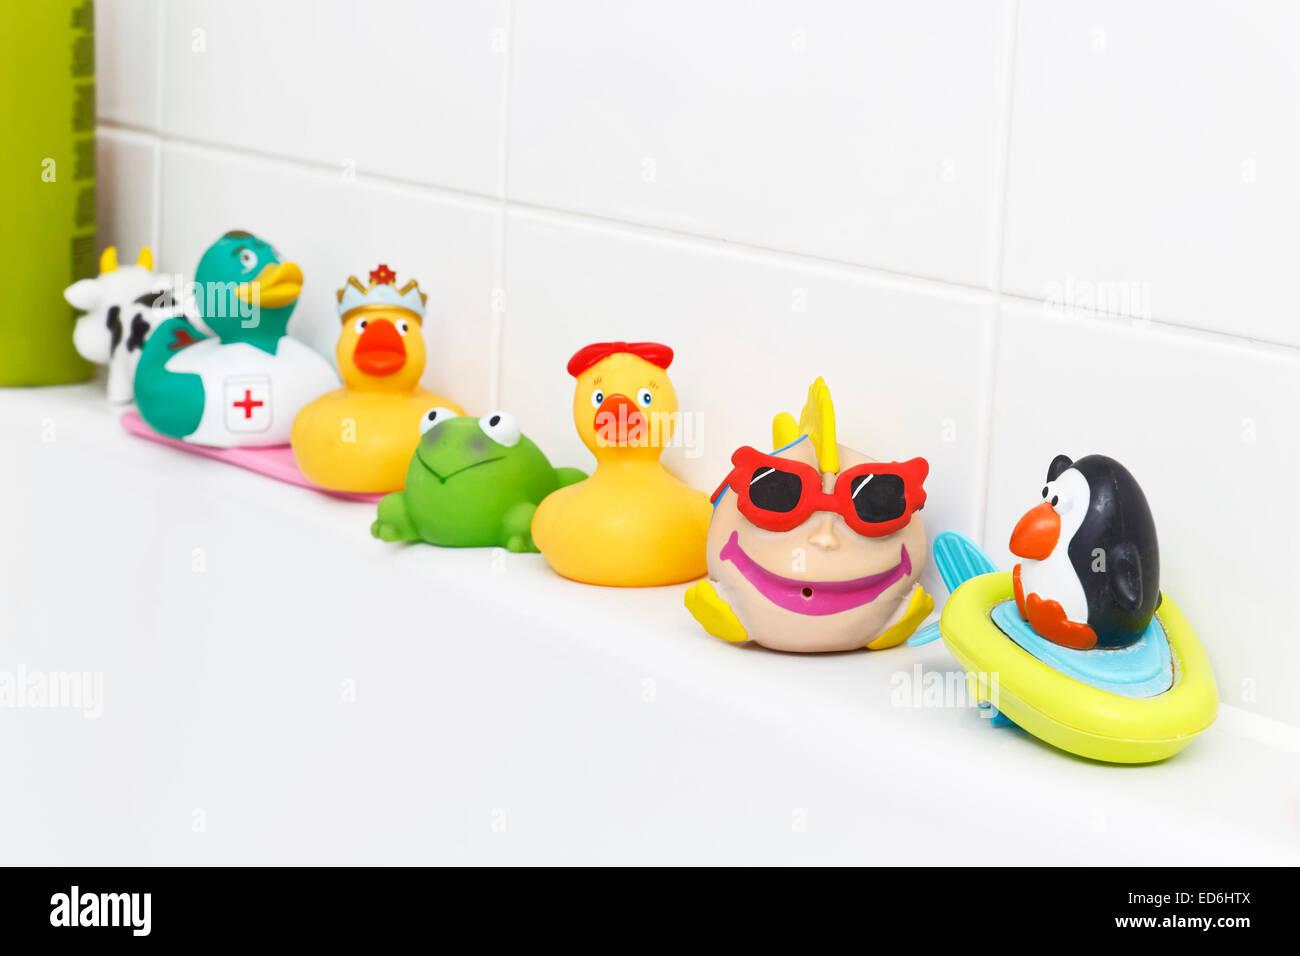 Bath Toys Rubber Plastic Stock Photos & Bath Toys Rubber Plastic ...